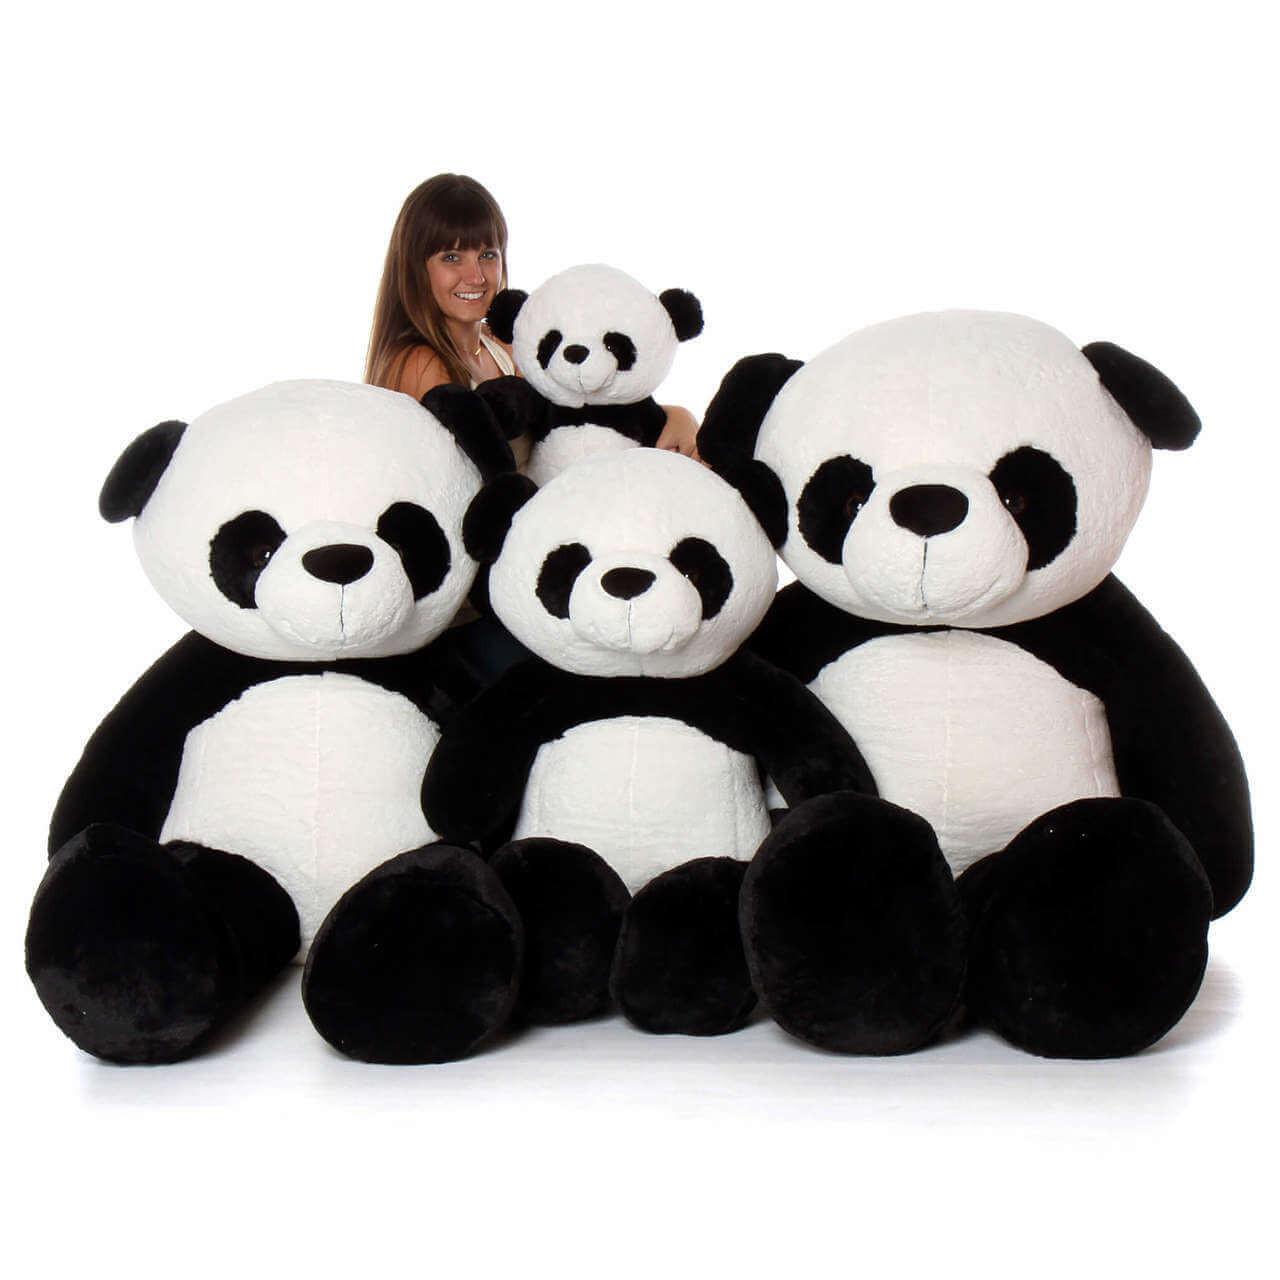 Big Plush Stuffed Giant Panda Family